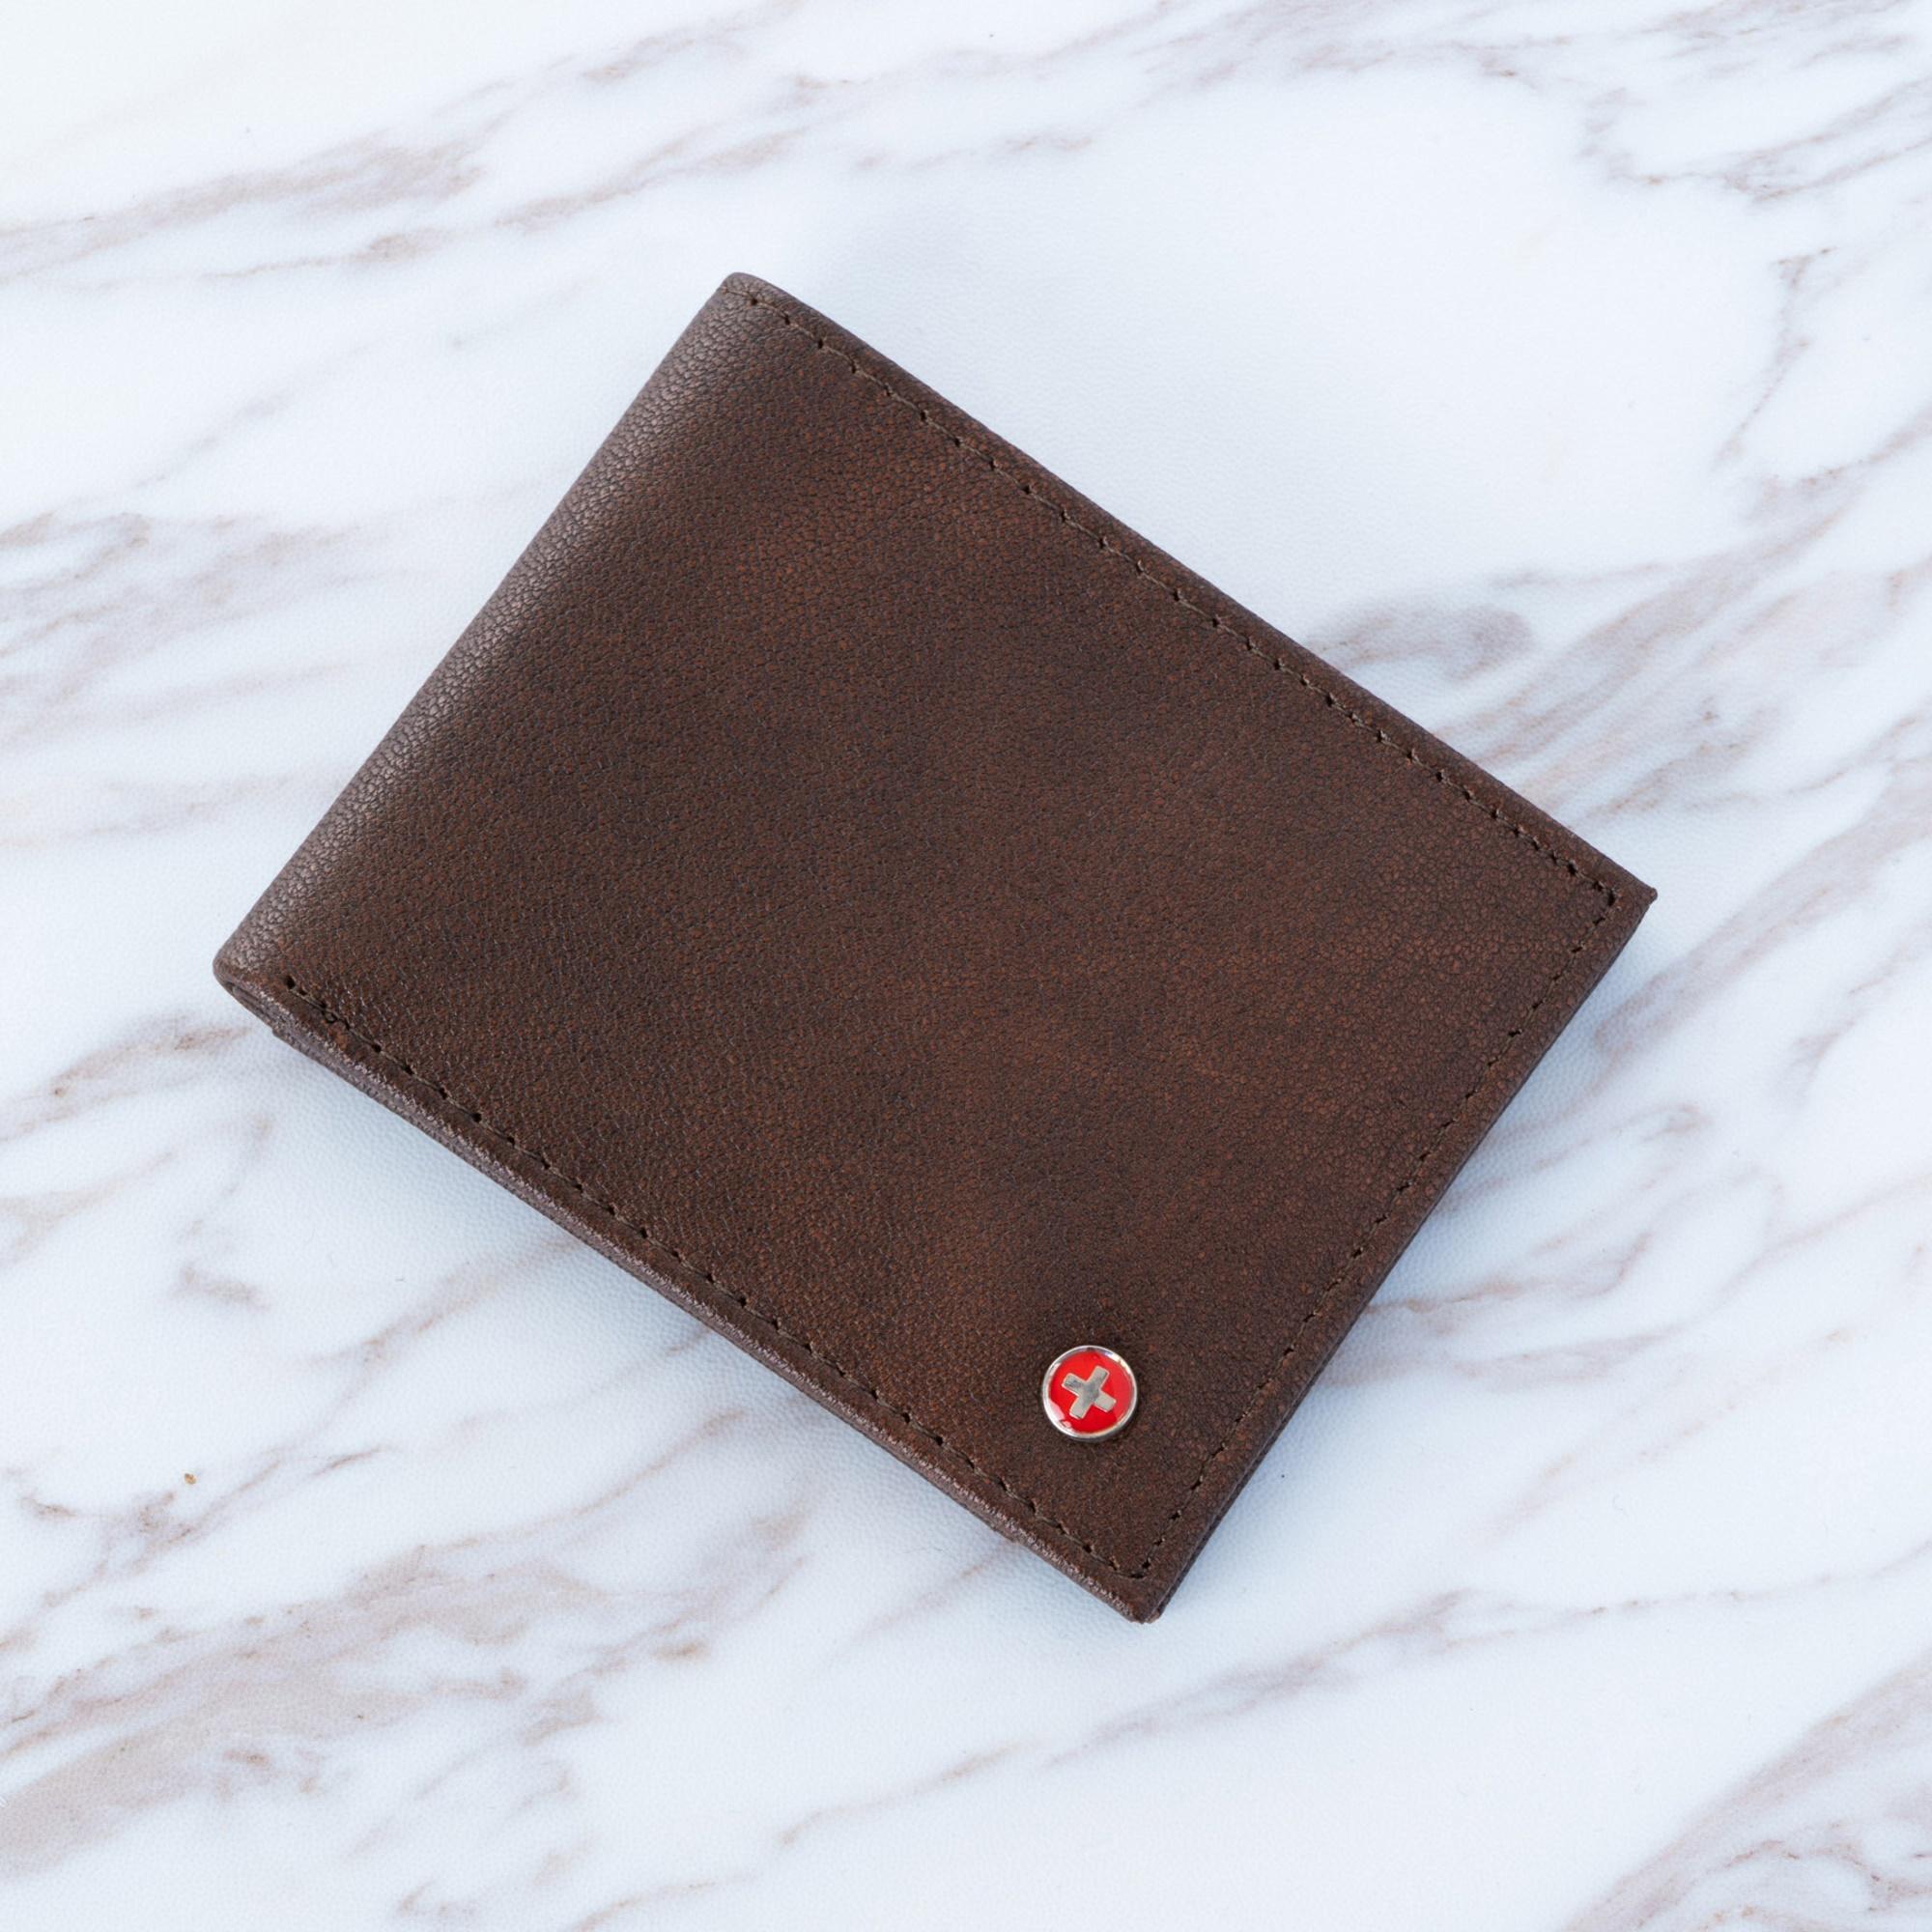 Alpine-Swiss-Mens-Thin-Bifold-Wallet-Top-Grain-Leather-EZ-Access-Outer-Card-Slot thumbnail 21